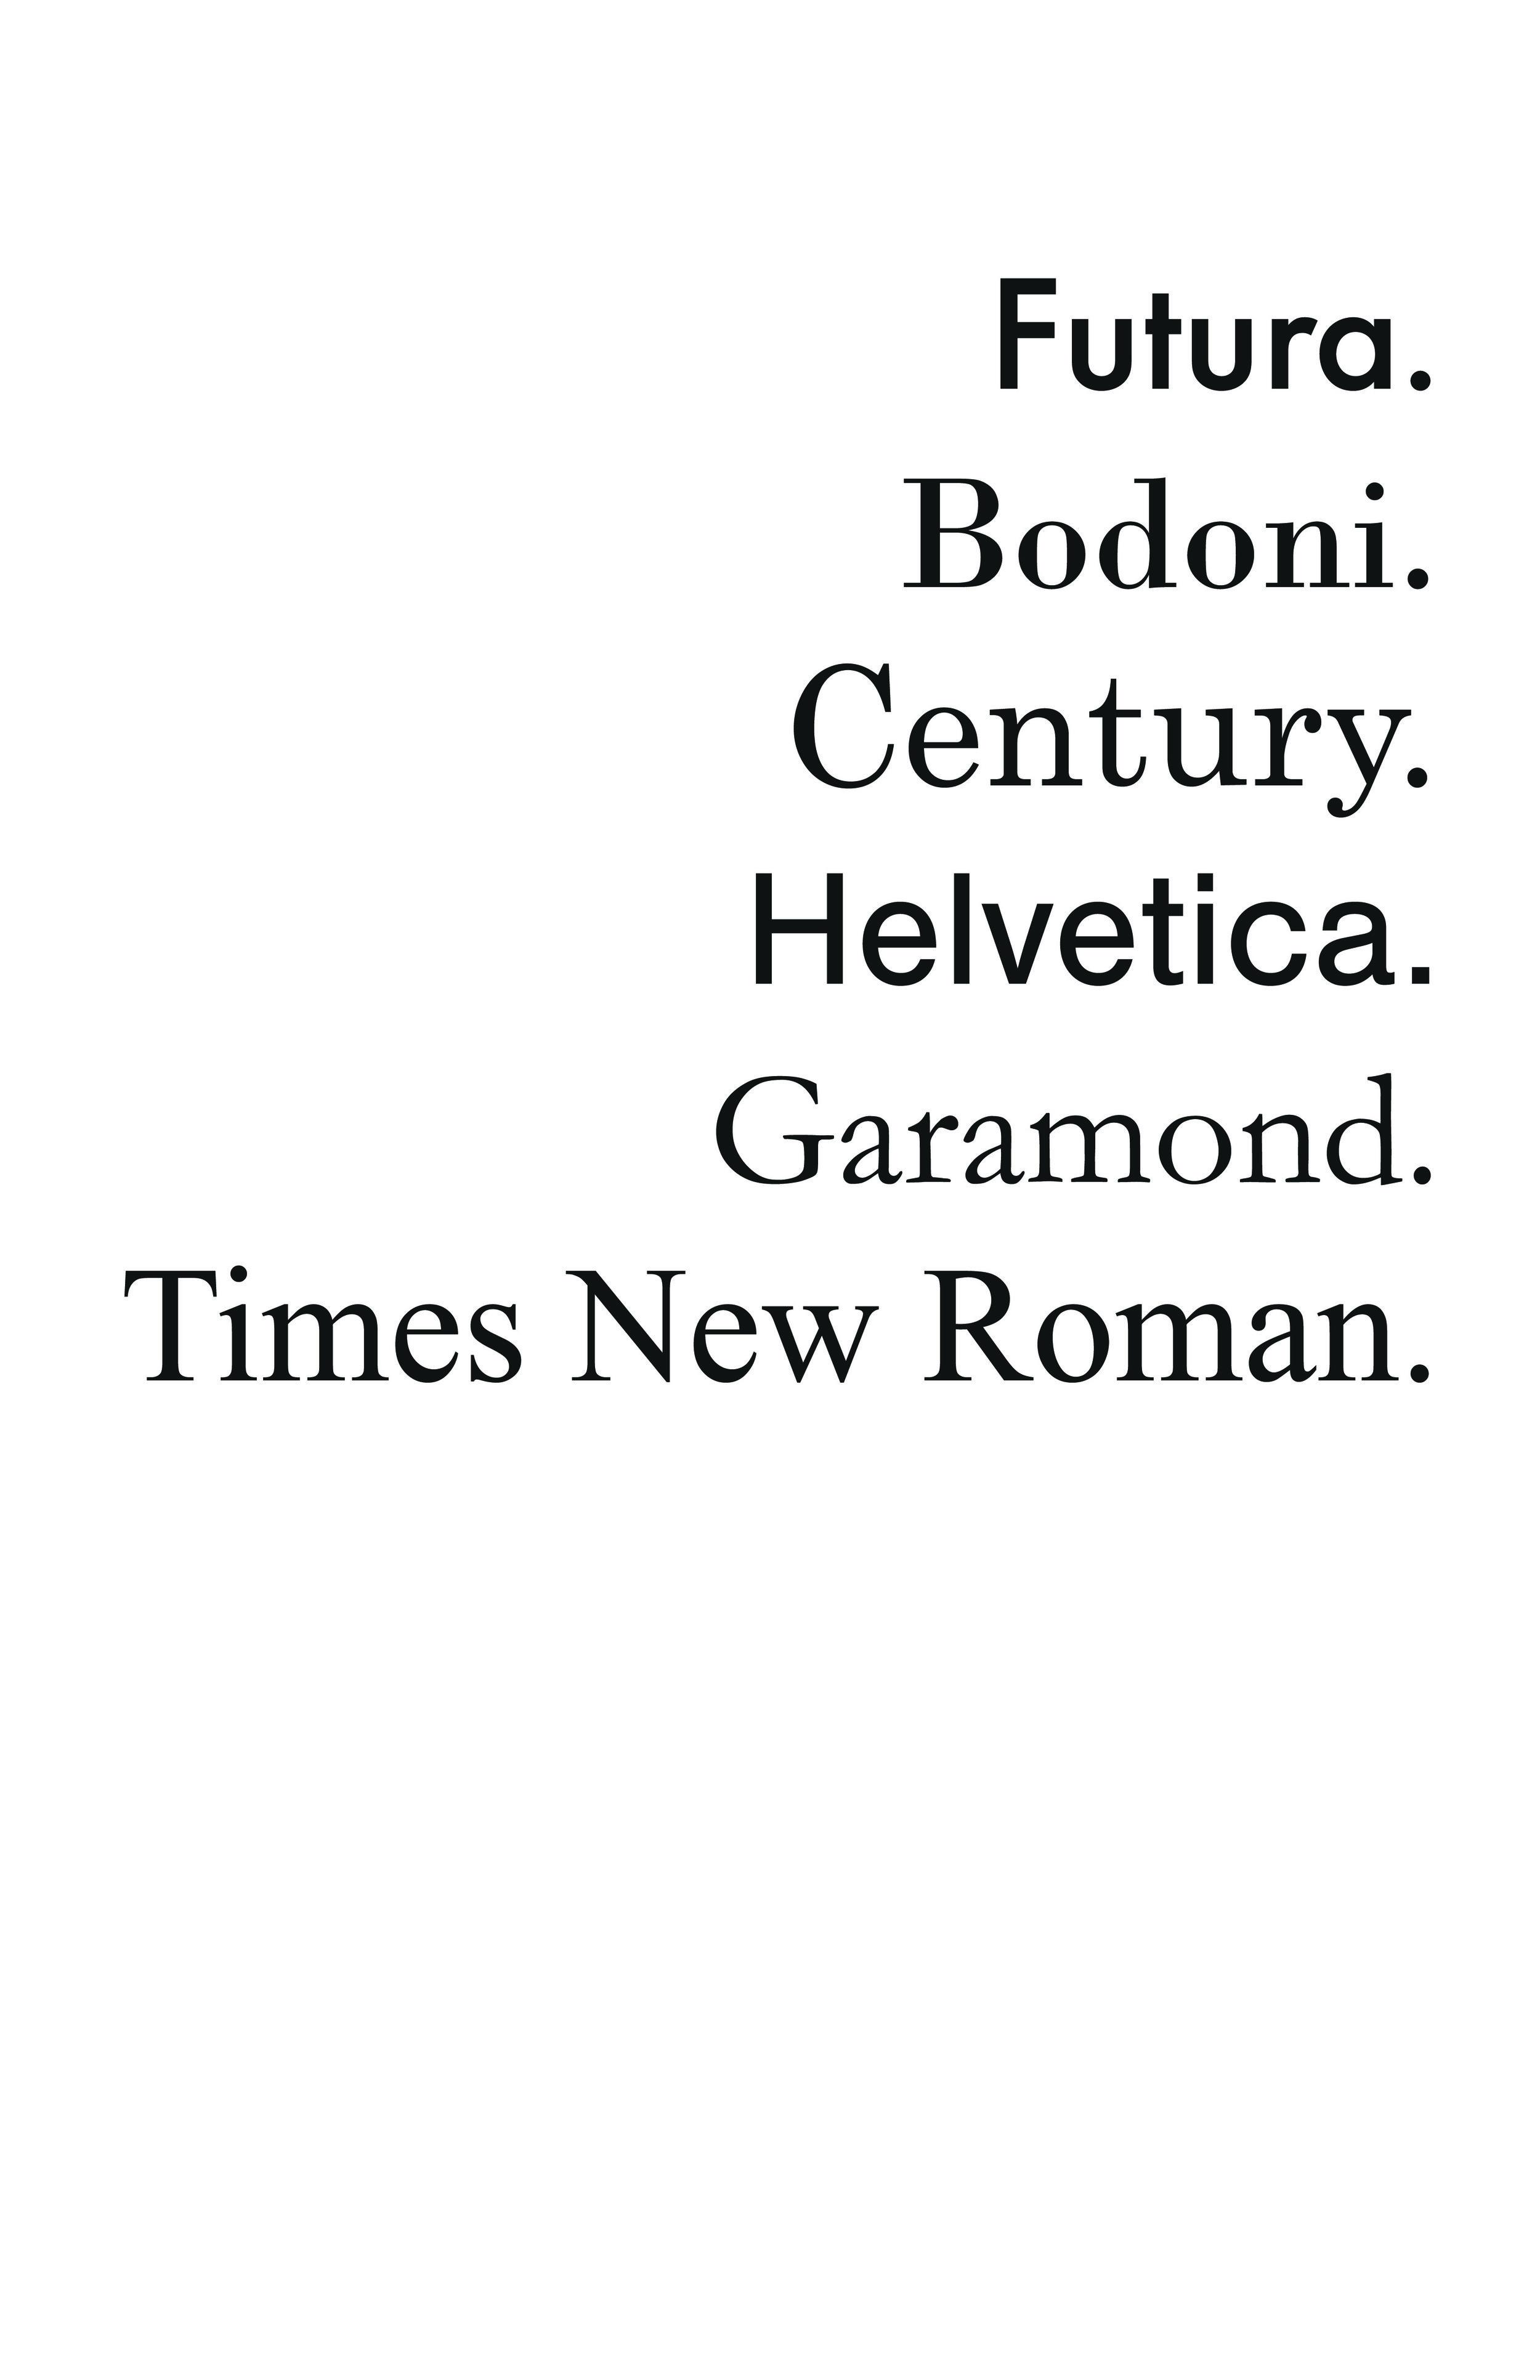 Fonts 11x17.jpg